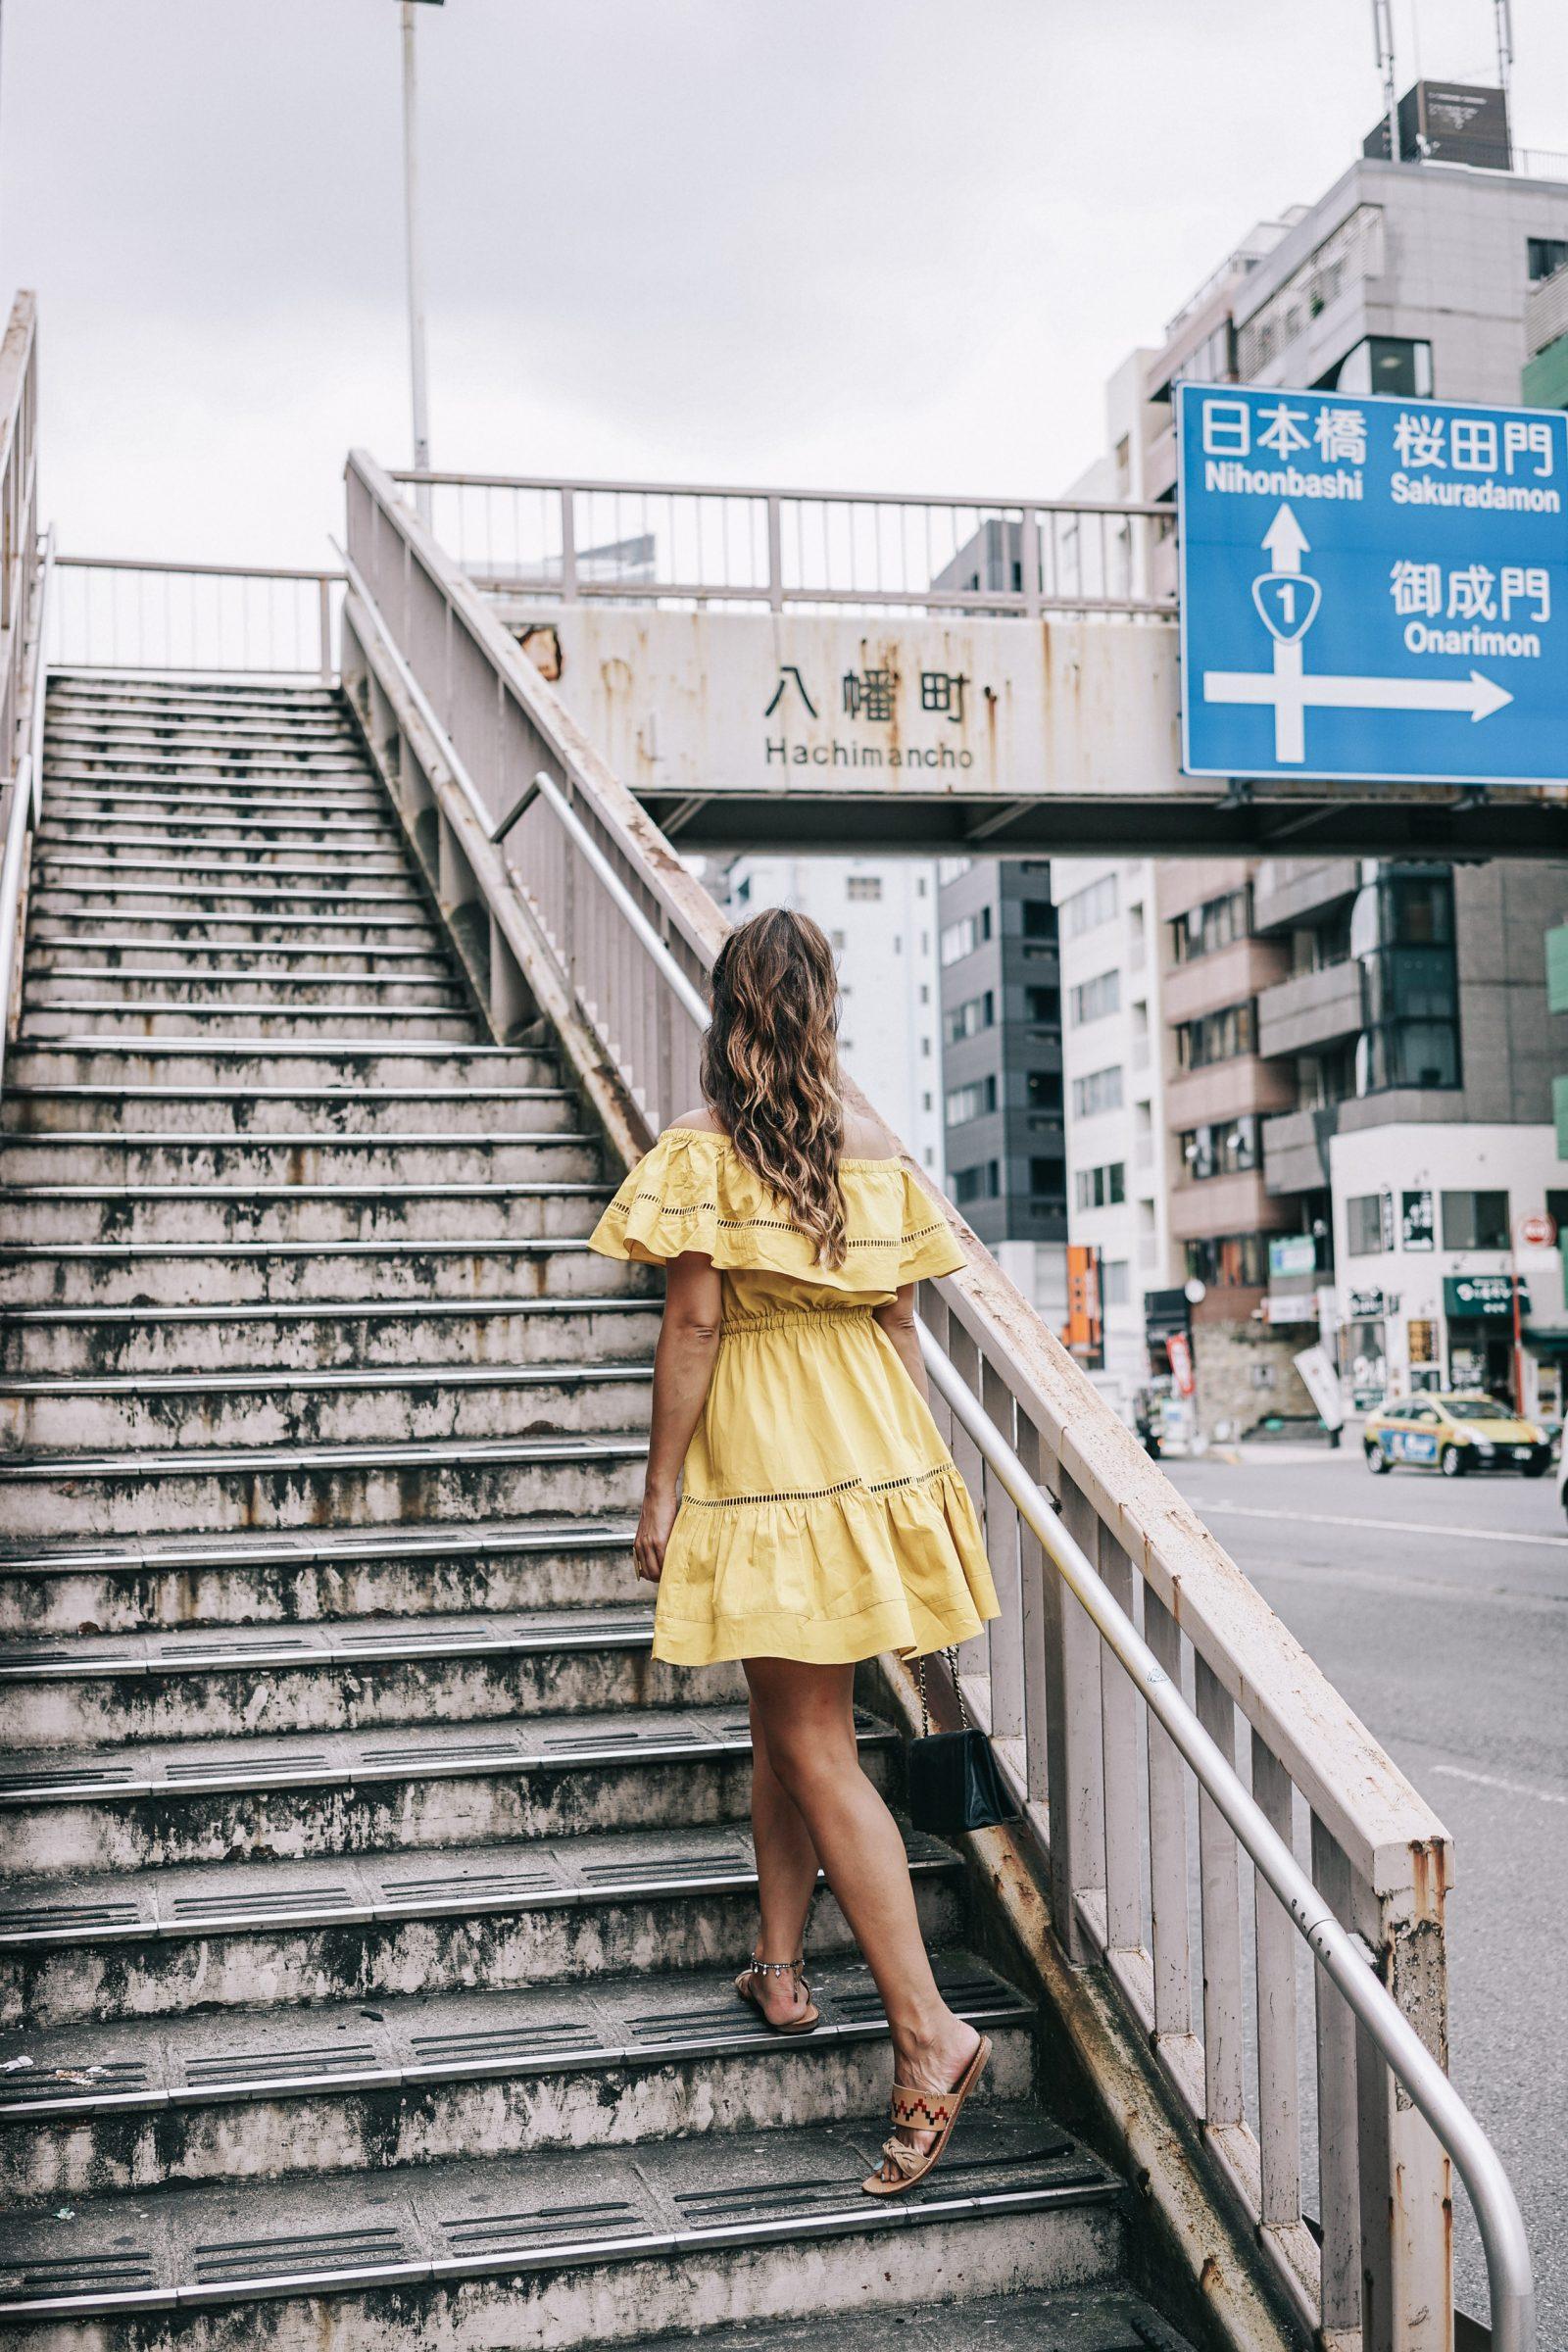 tokyo_travel_guide-outfit-collage_vintage-street_style-off_the_shoulders_dress-mustard_dress-soludos_sandals-chanel_vintage-bag-vintage_stores-30